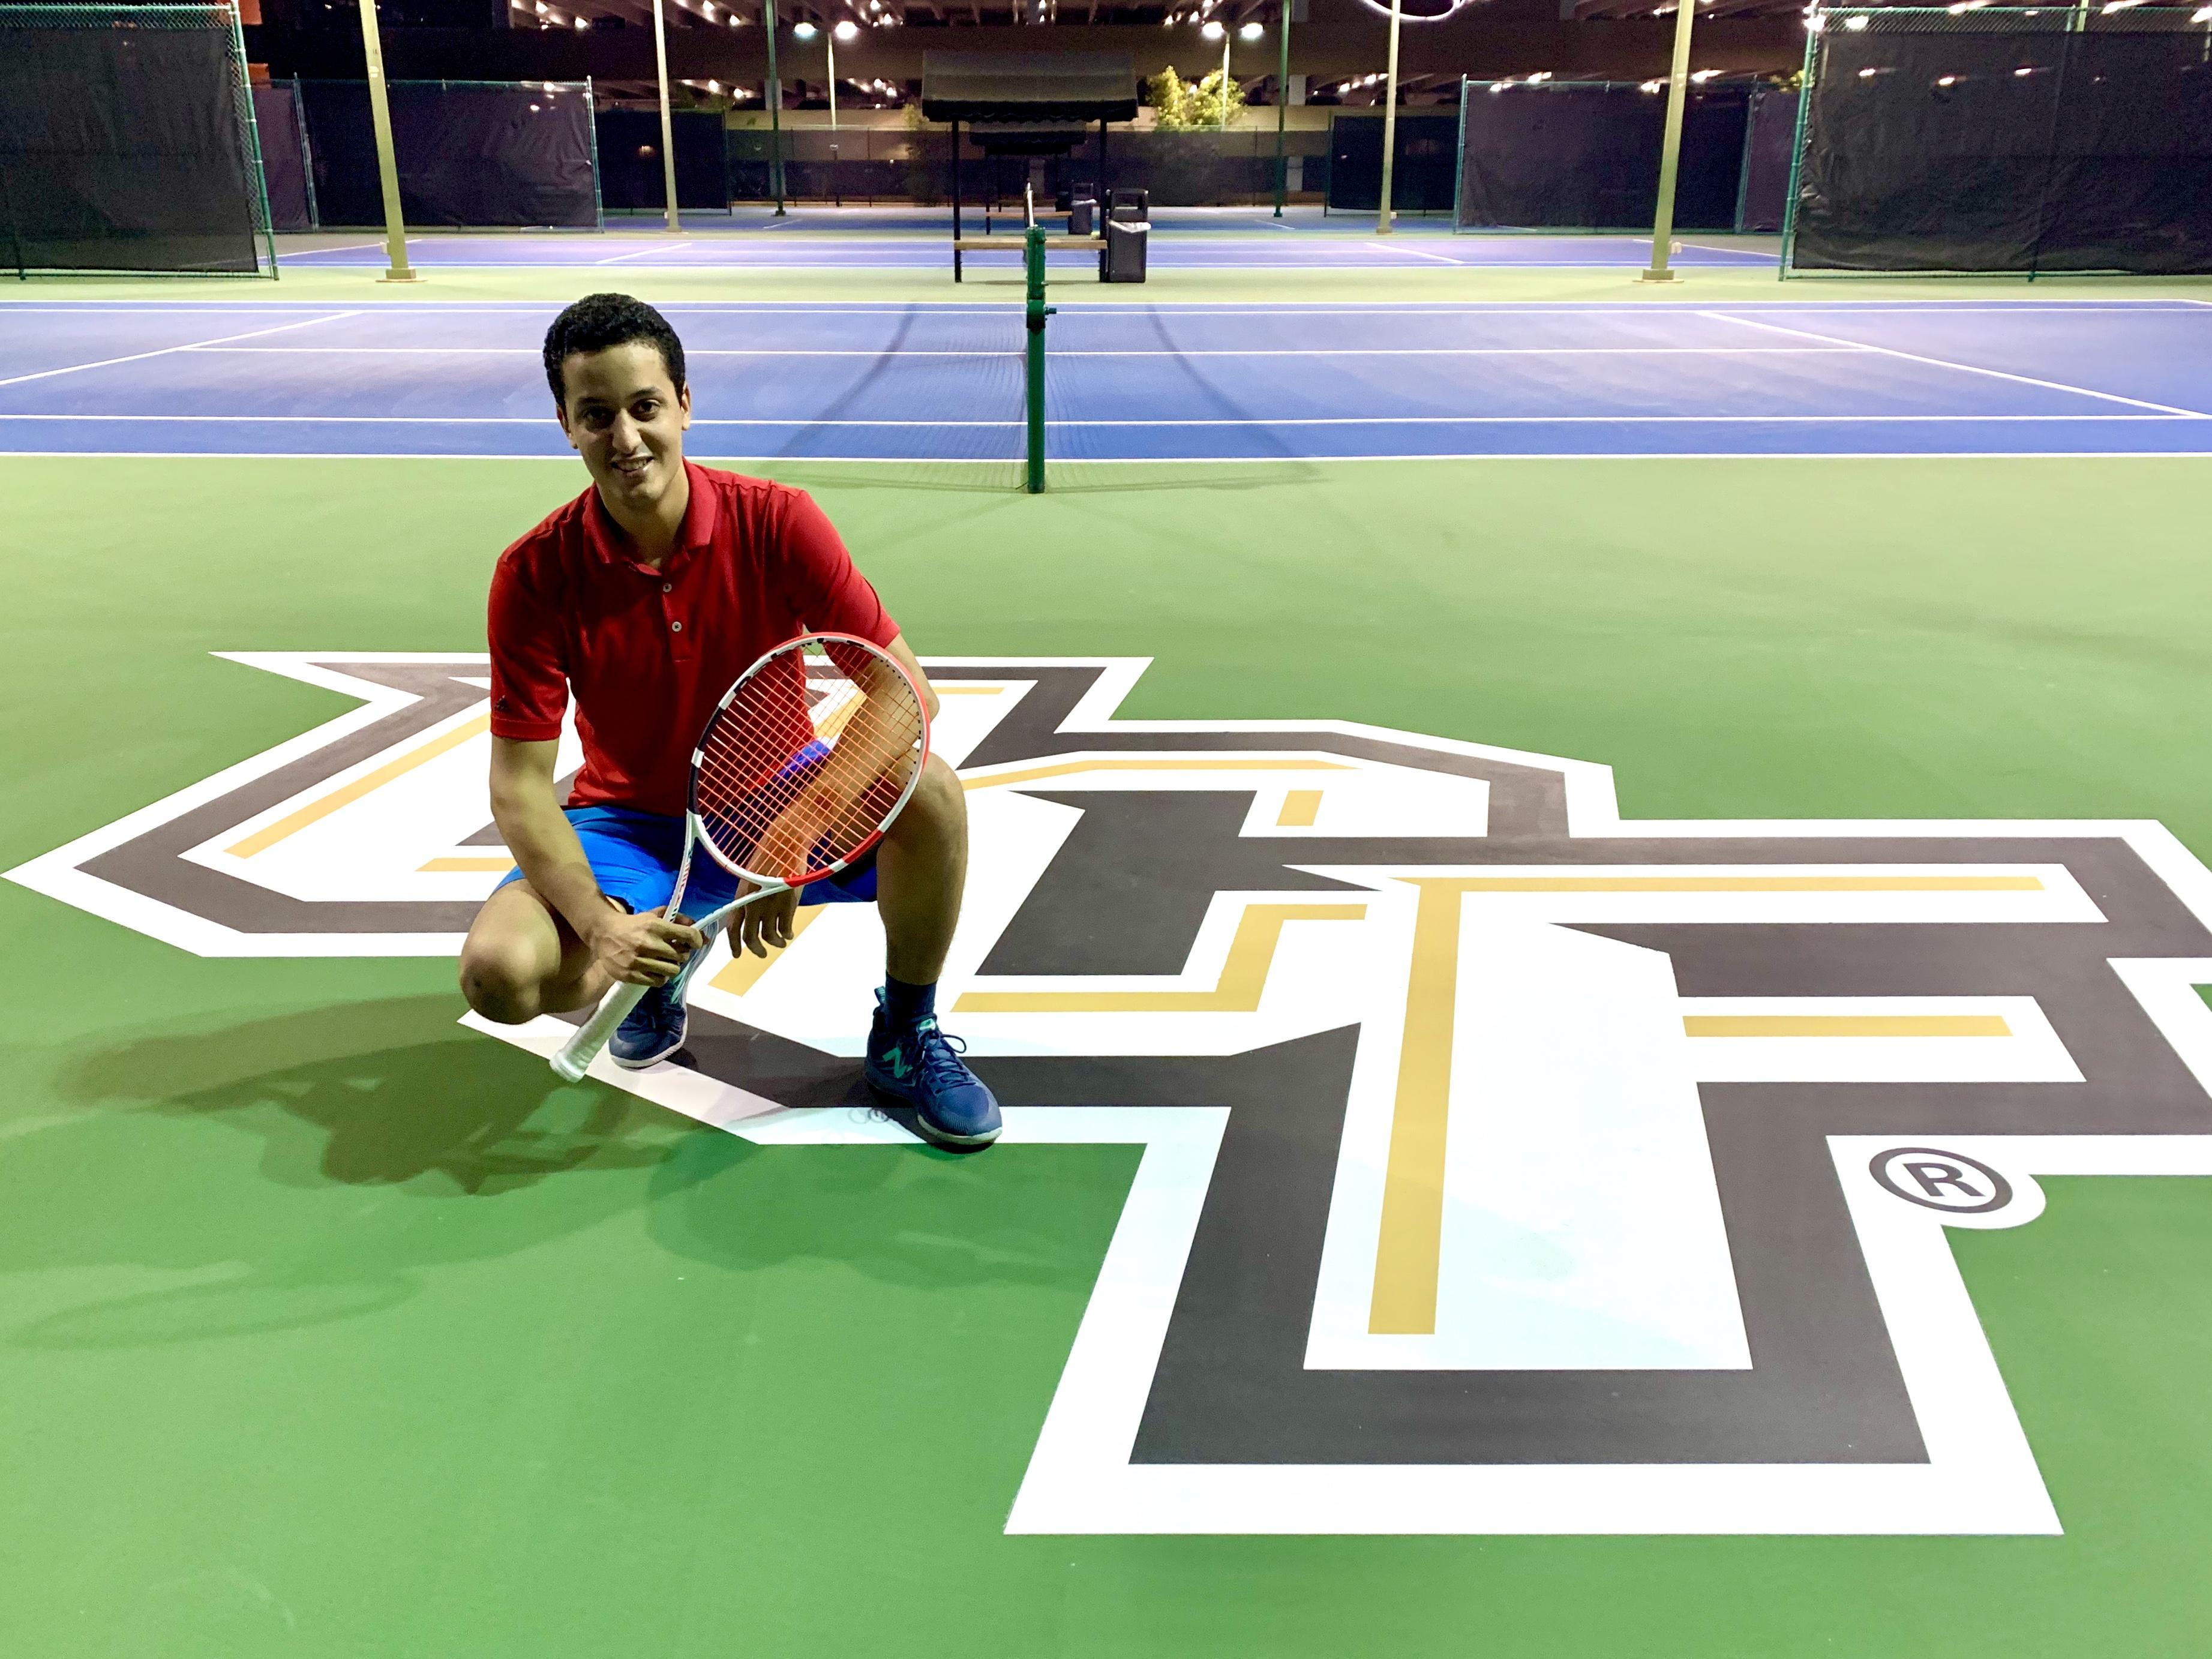 Ucf tennis